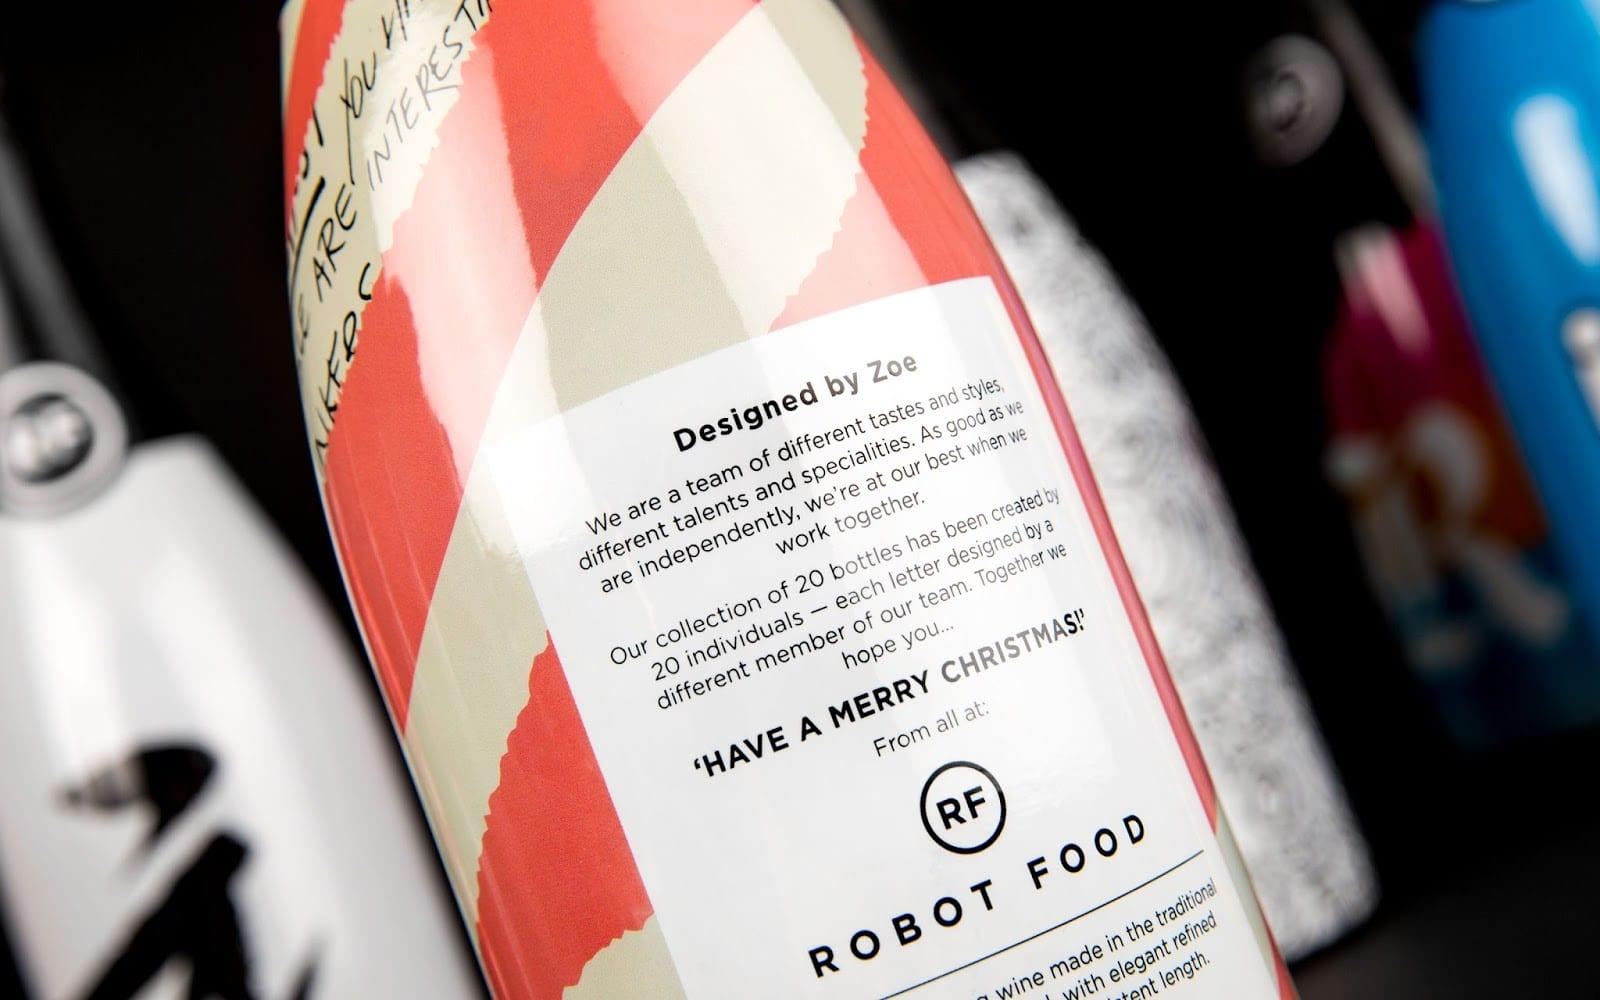 RF ChristmasBottles Close2 - Ach, tie obaly - 'Have a Merry Christmas!' od všech zRobot Food